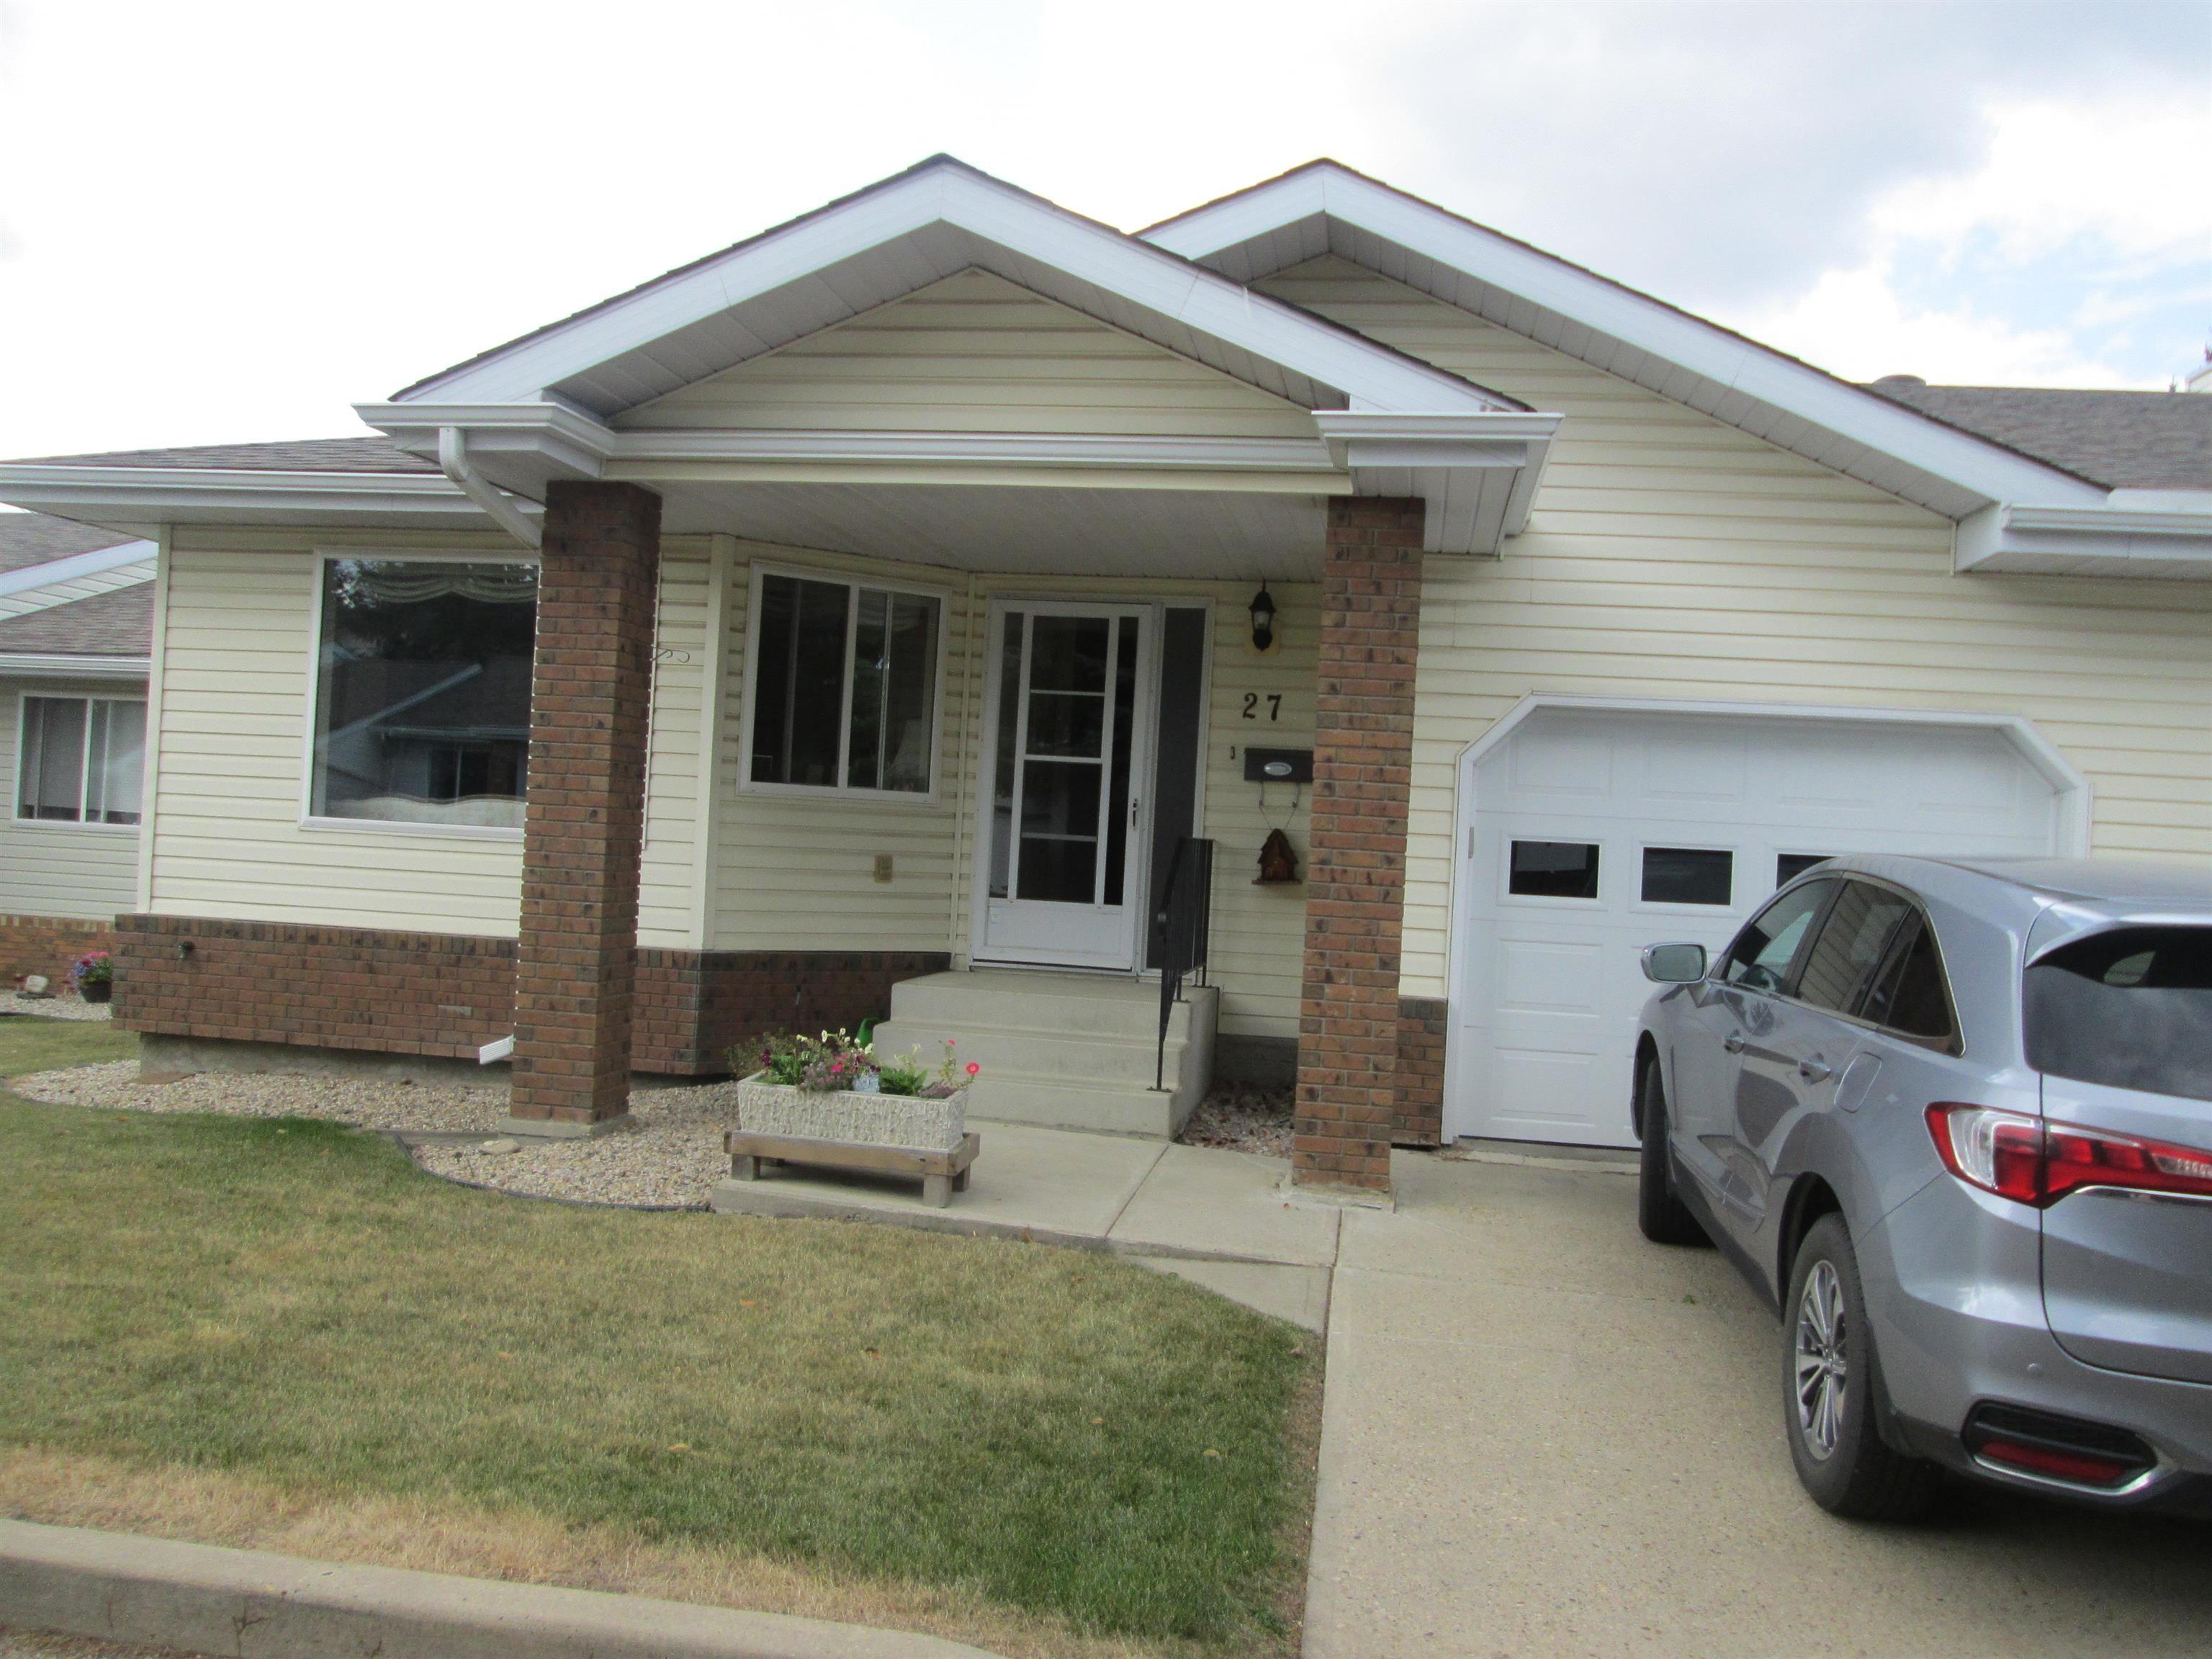 Main Photo: 27 903 109 Street in Edmonton: Zone 16 House Half Duplex for sale : MLS®# E4259189